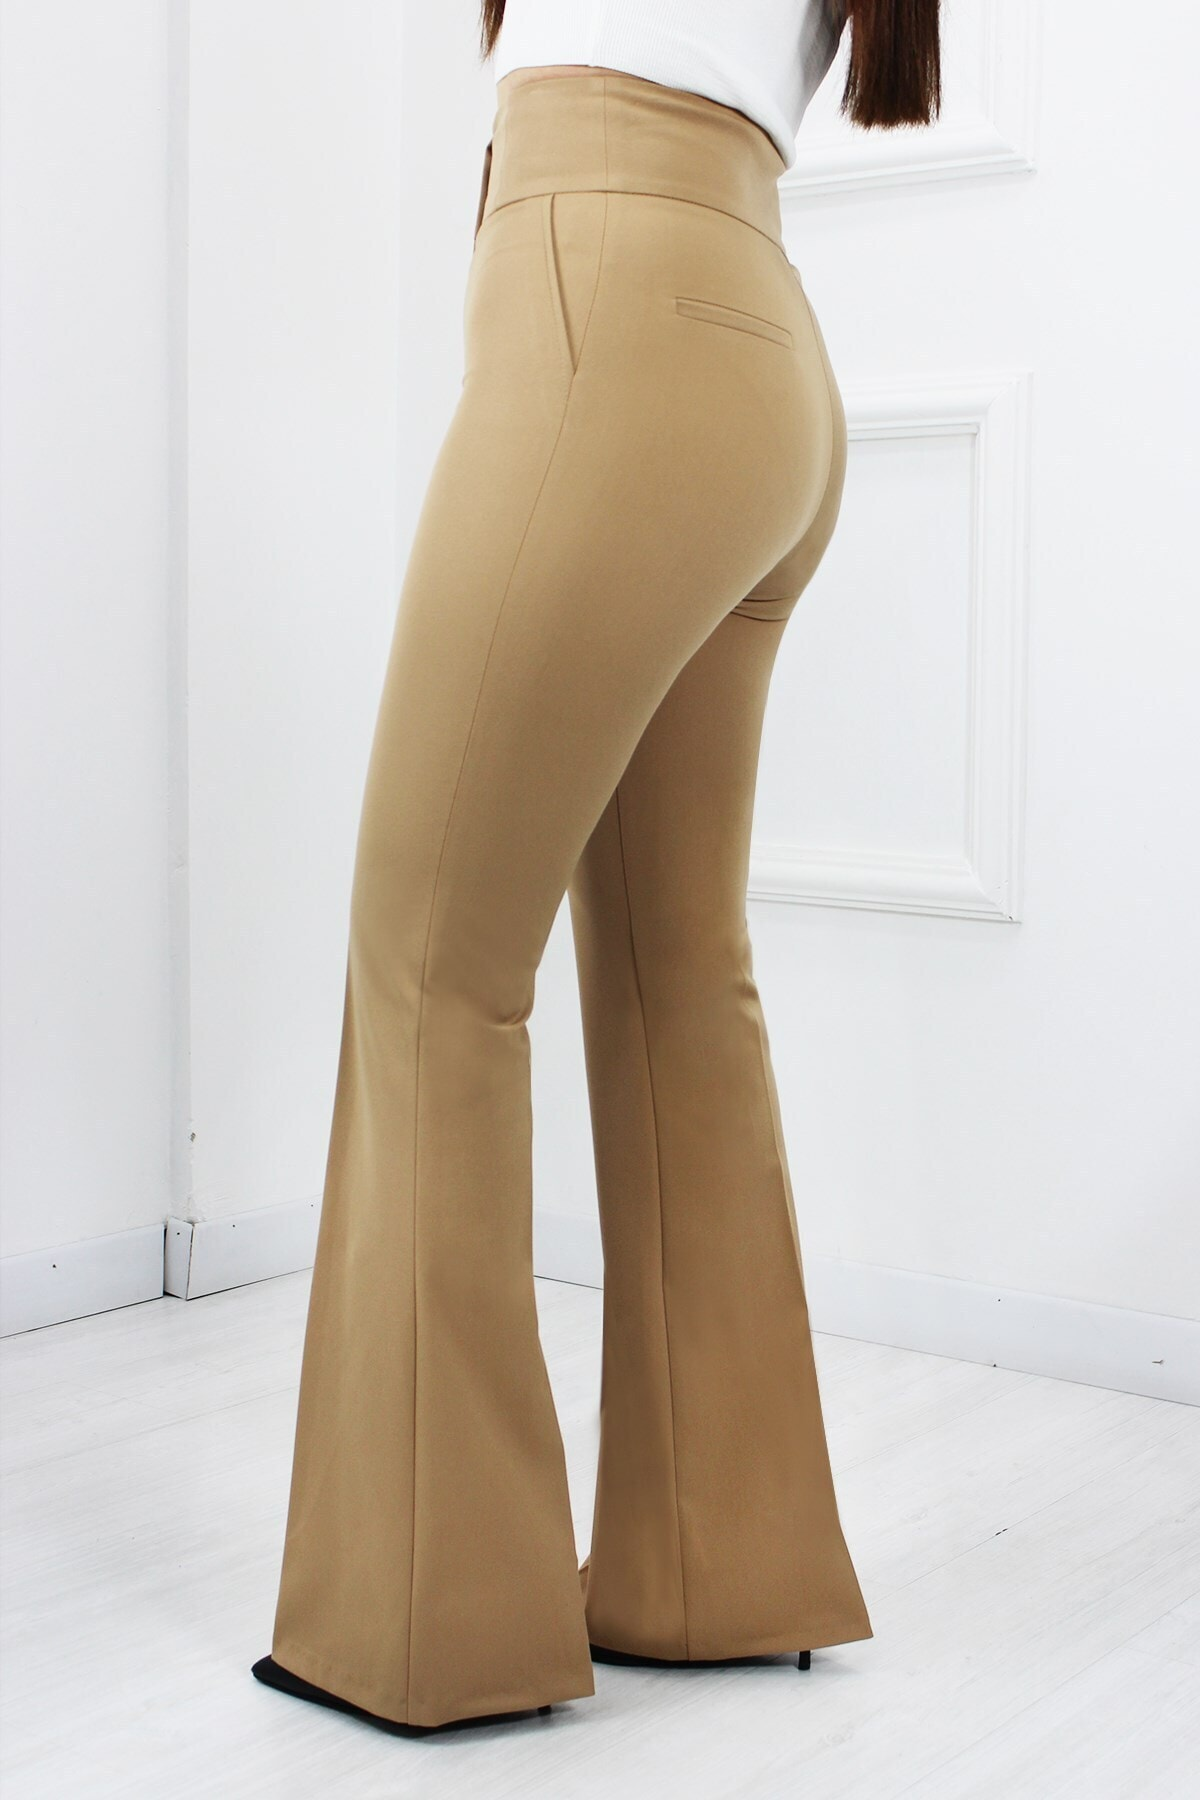 UGİMPOL Pantolon Yüksek Bel Ispanyol 2